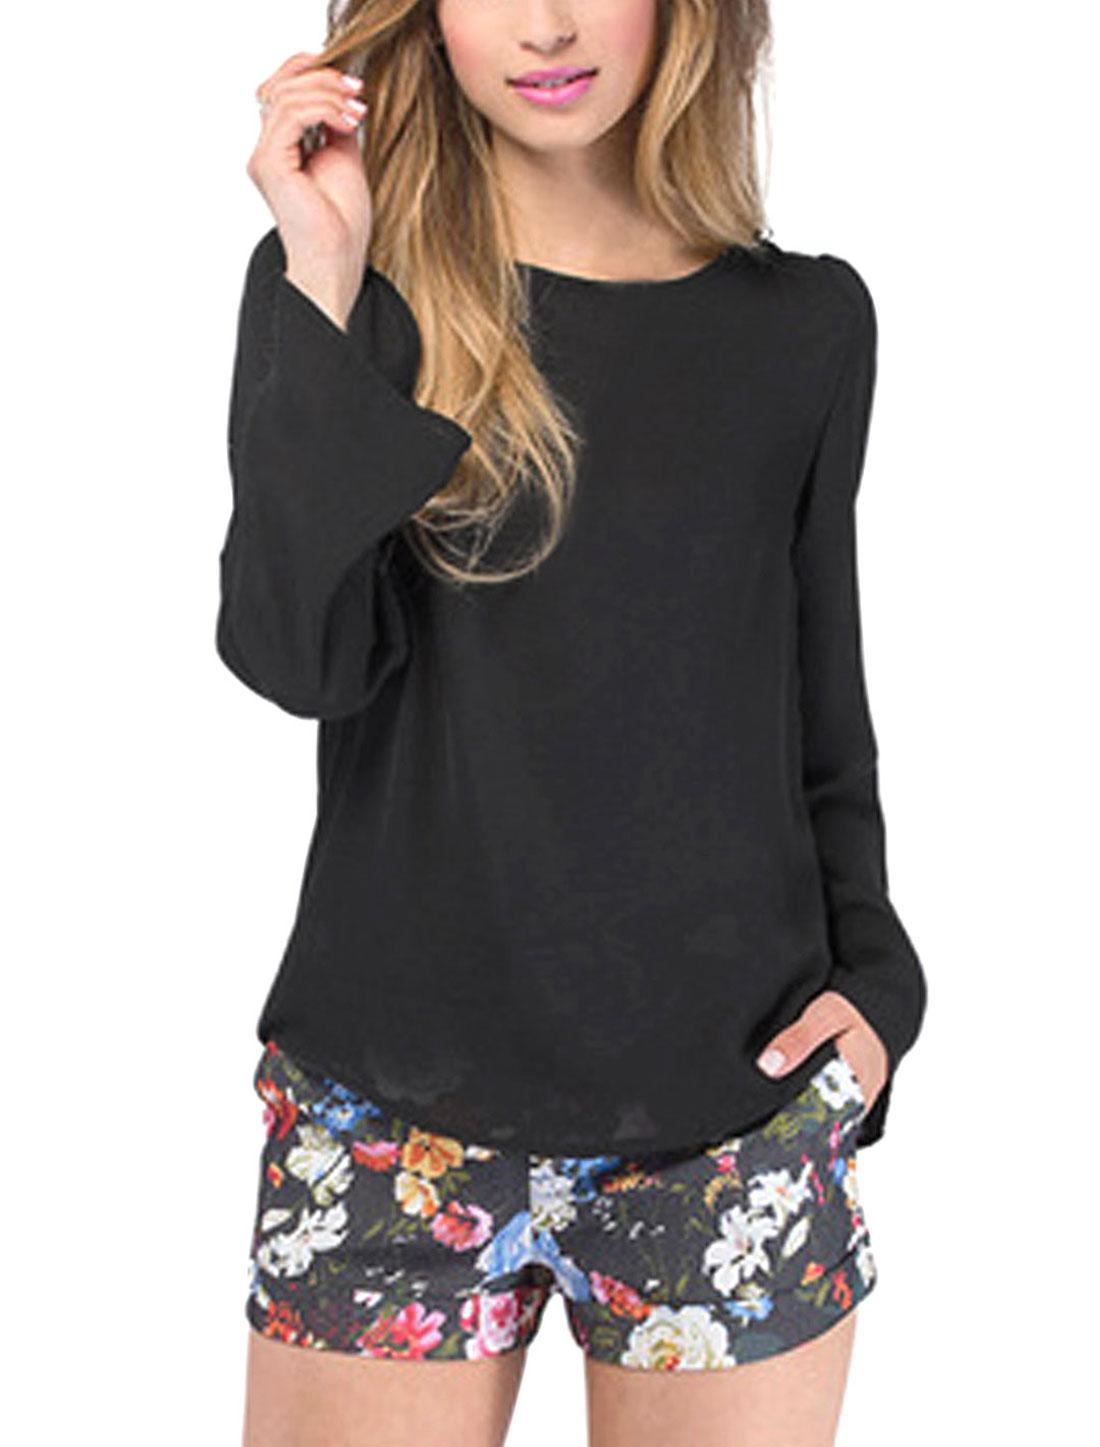 Lady Long Sleeves Curved Hem Chiffon Shirts Black M